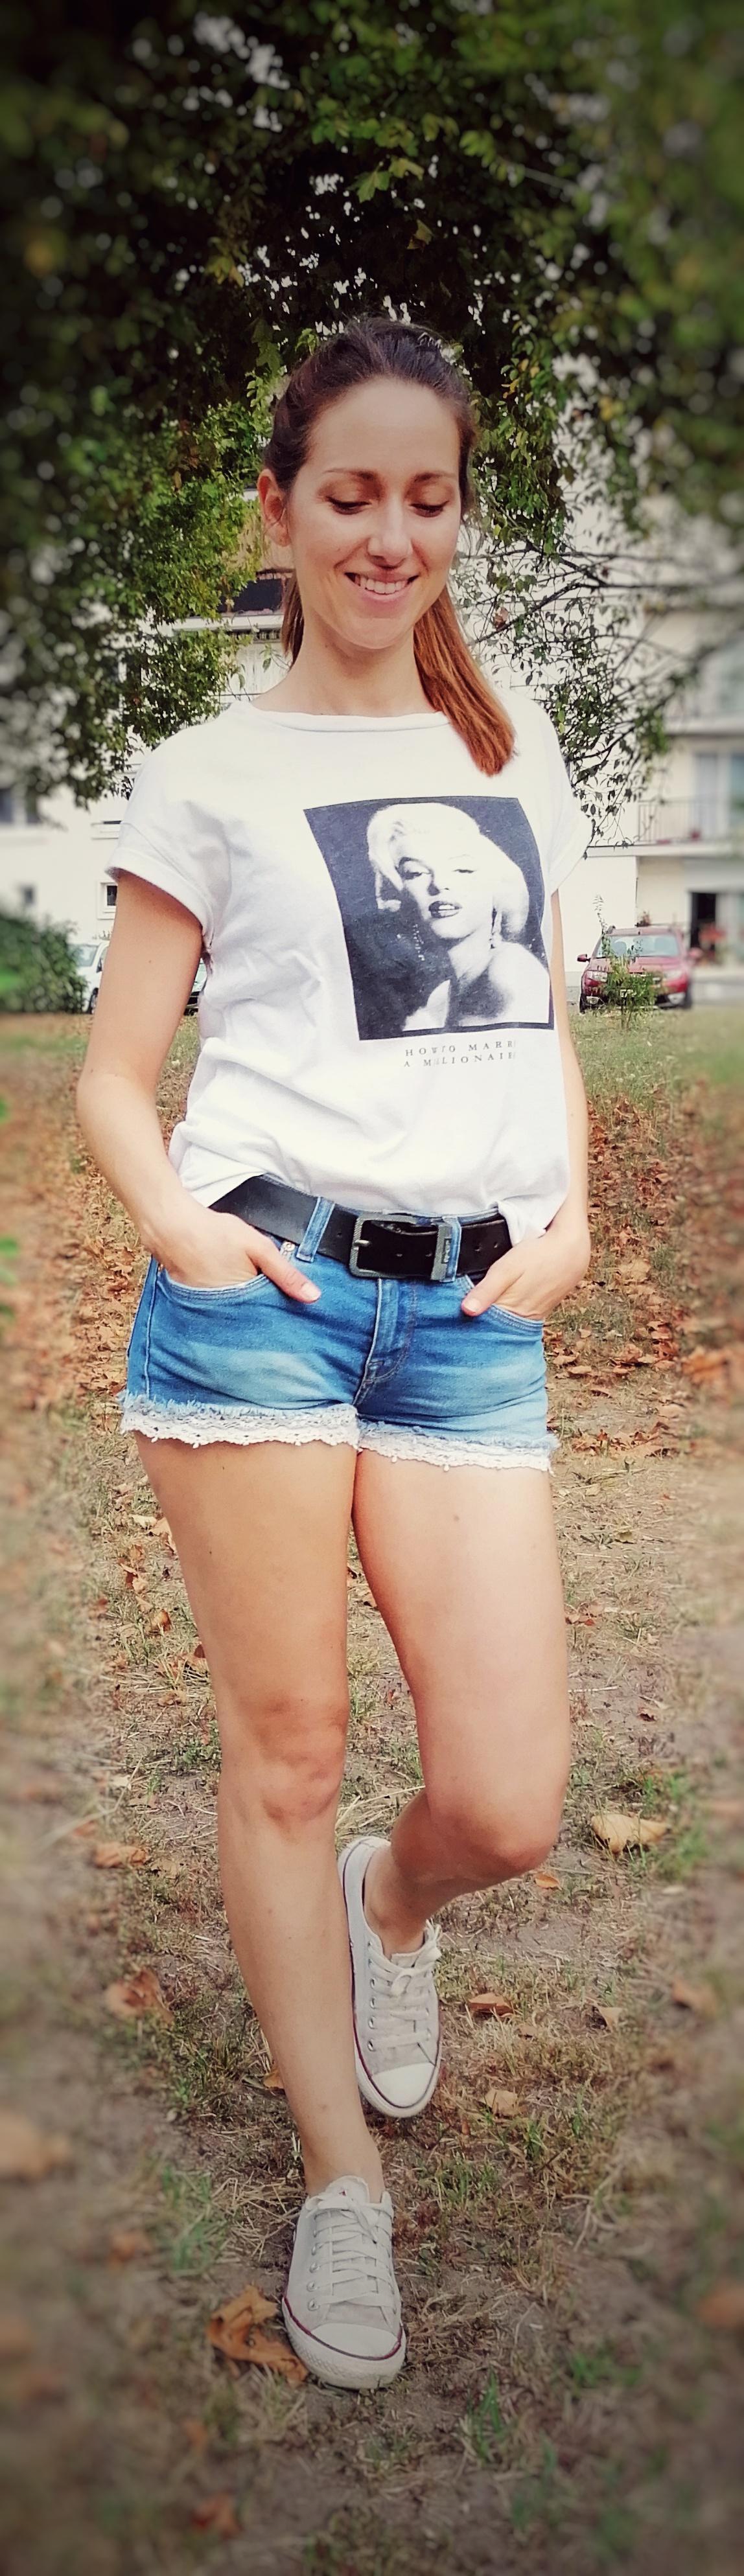 Ceinture Levi's et tee-shirt Marilyn